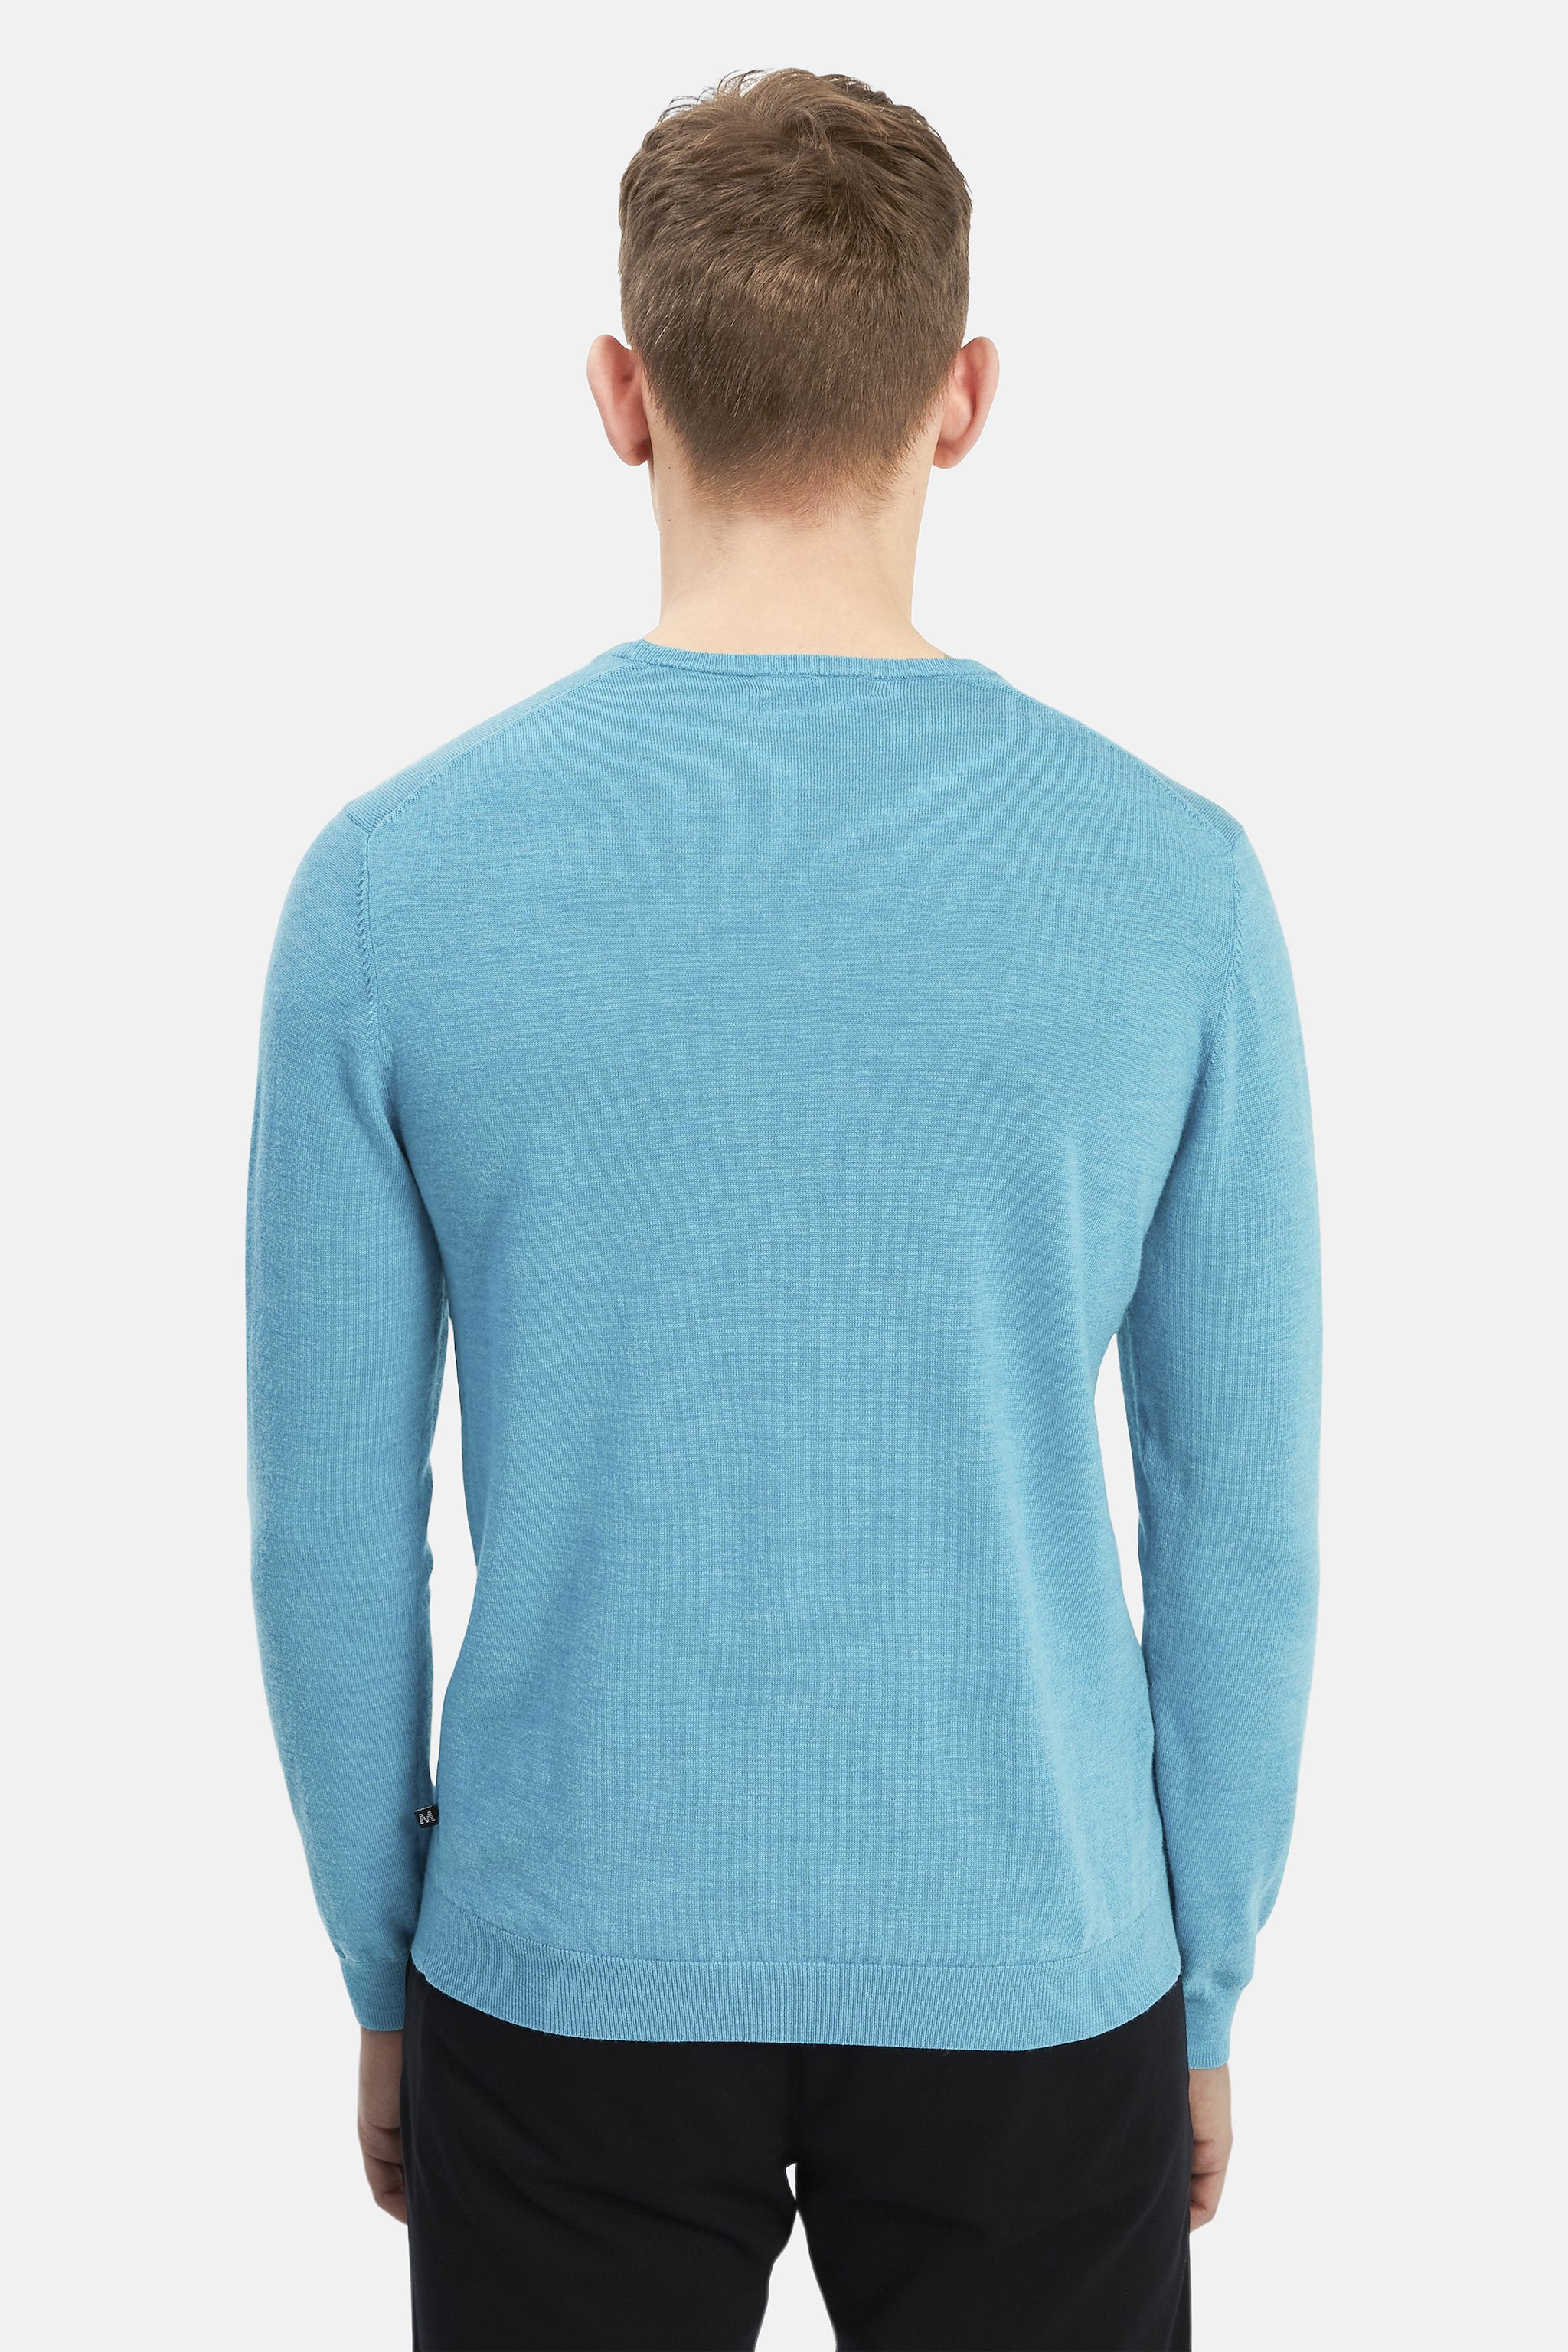 Matinique Margrate pullover, blue moon melange, x-large